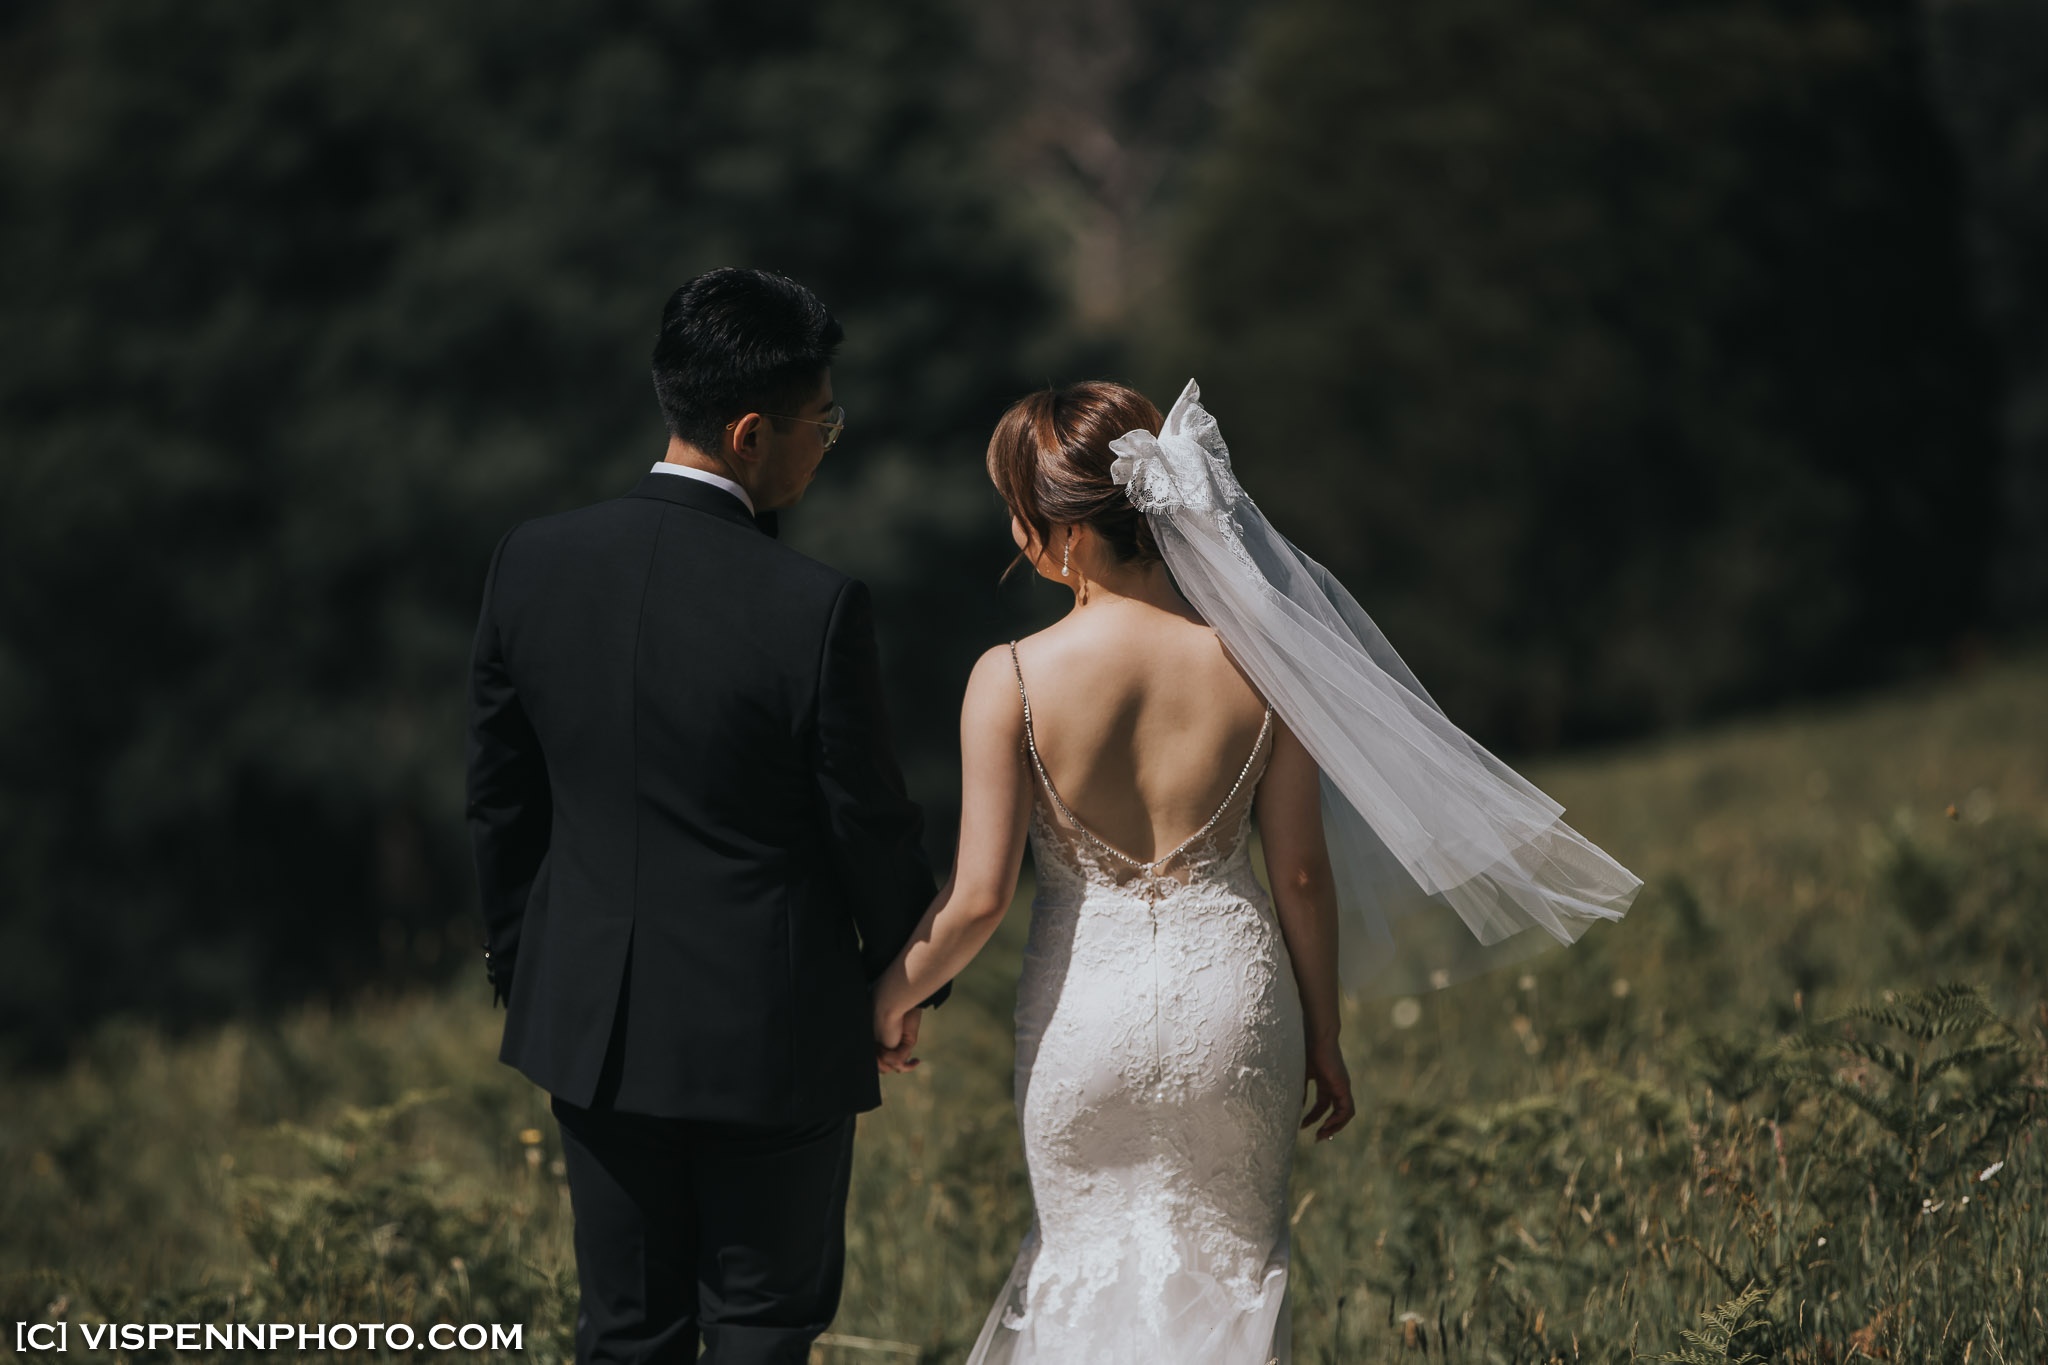 WEDDING DAY Photography Melbourne ElitaPB 06584 2P 1DX2 ZHPENN